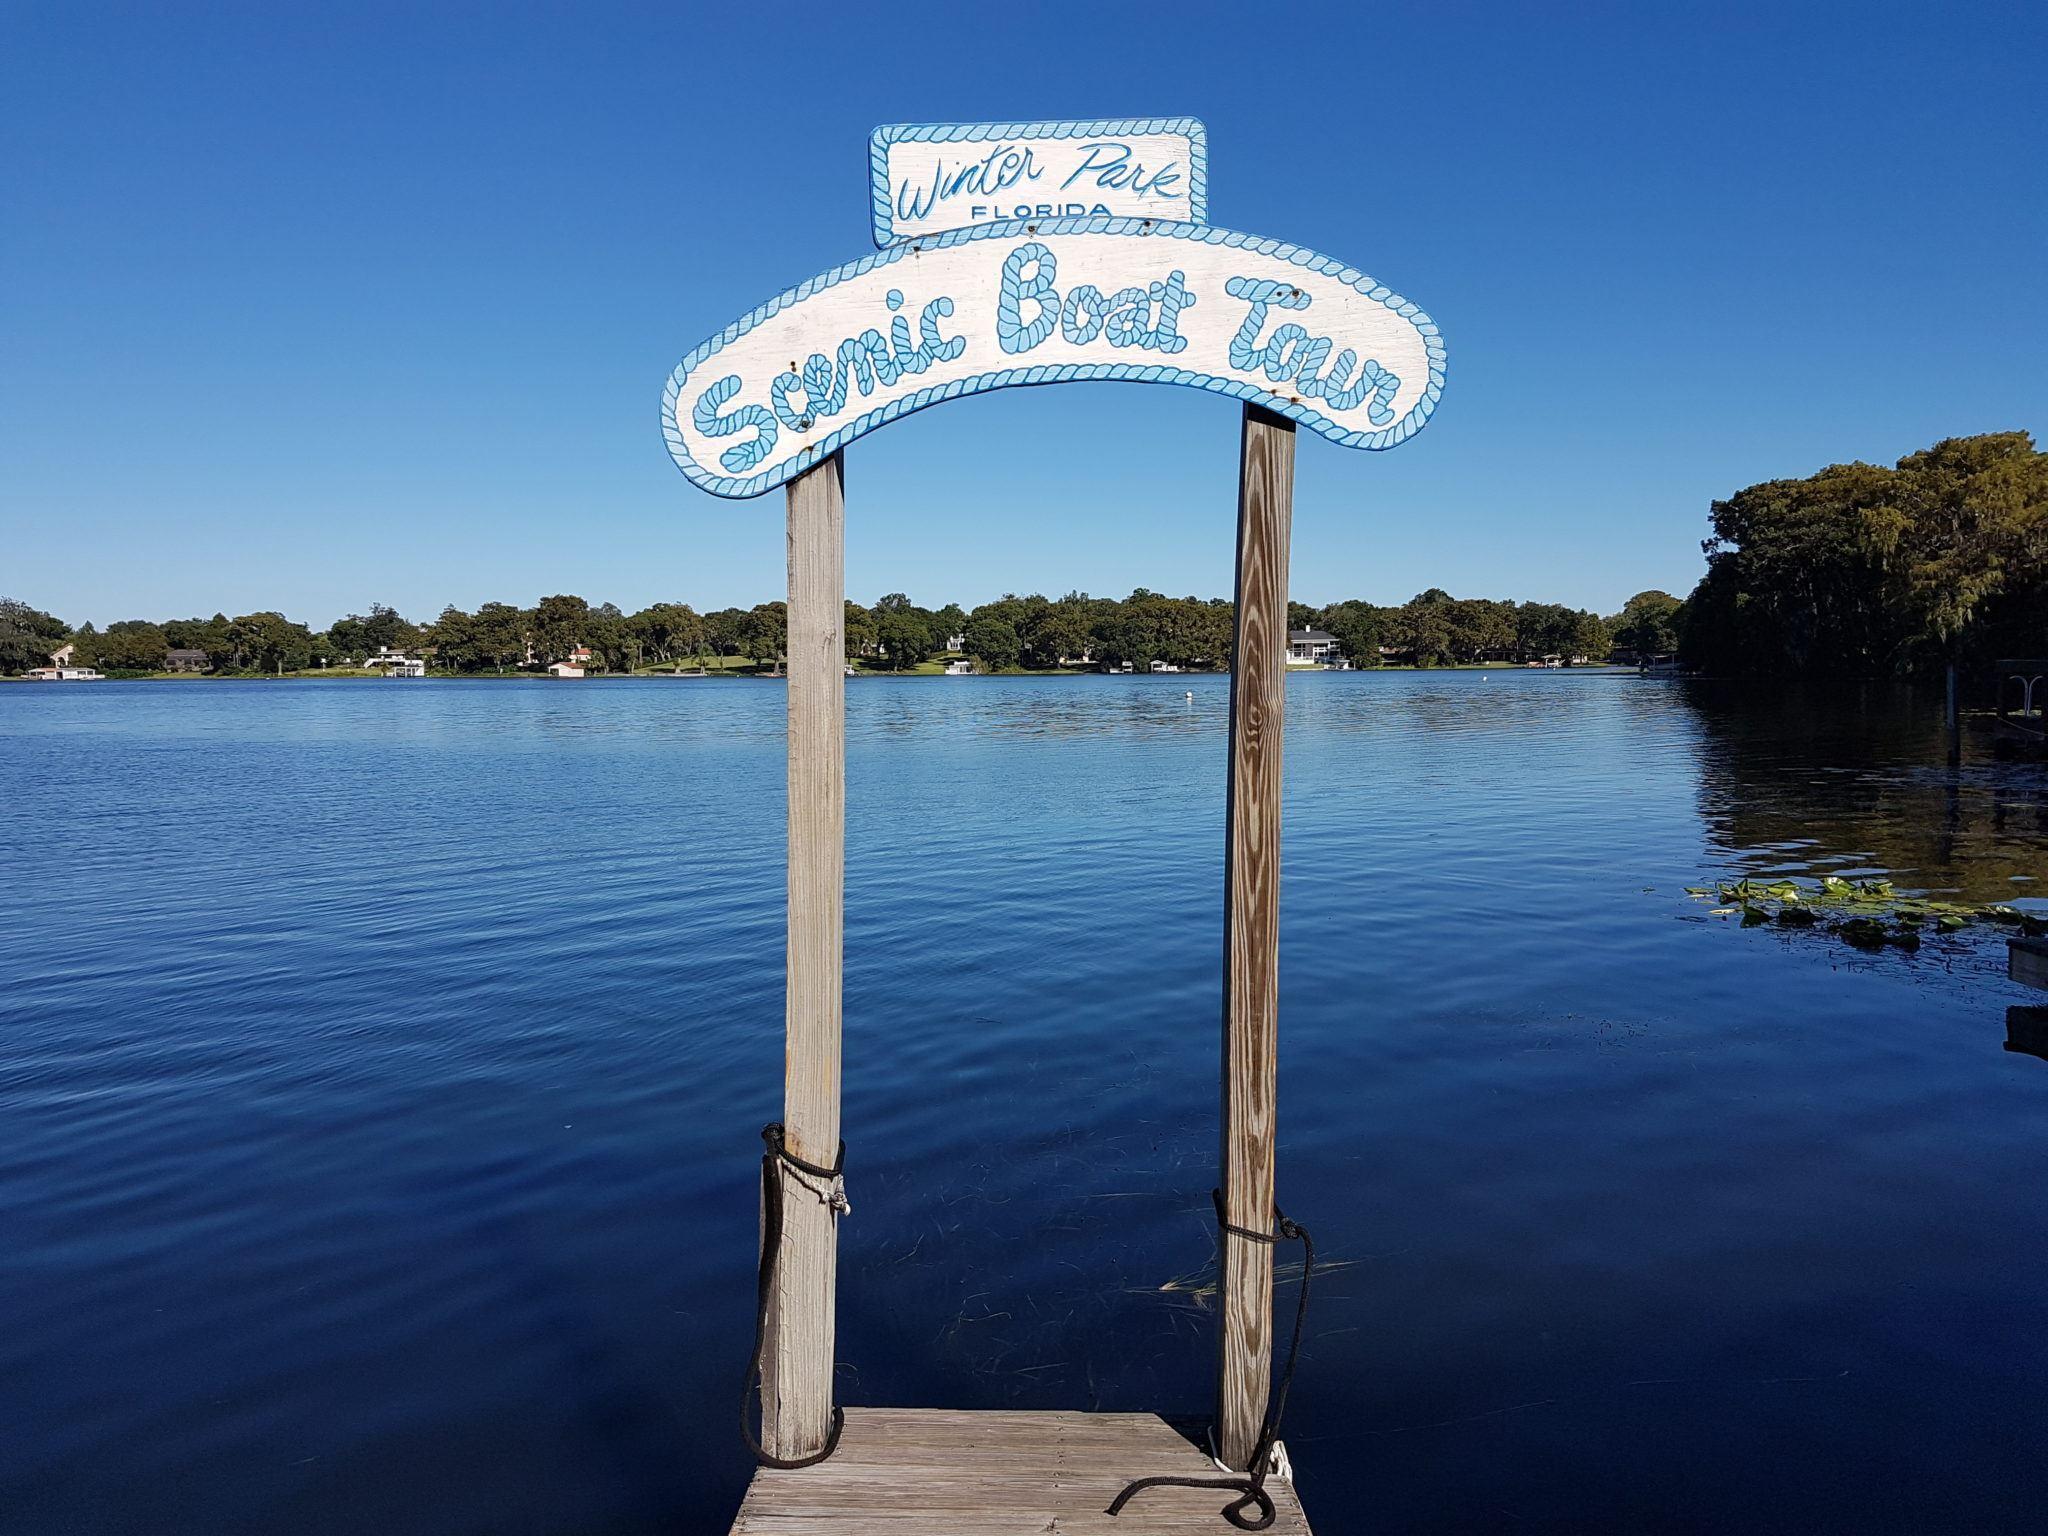 Scenic Boat Tours Winter Park. Image by Ella Buchan